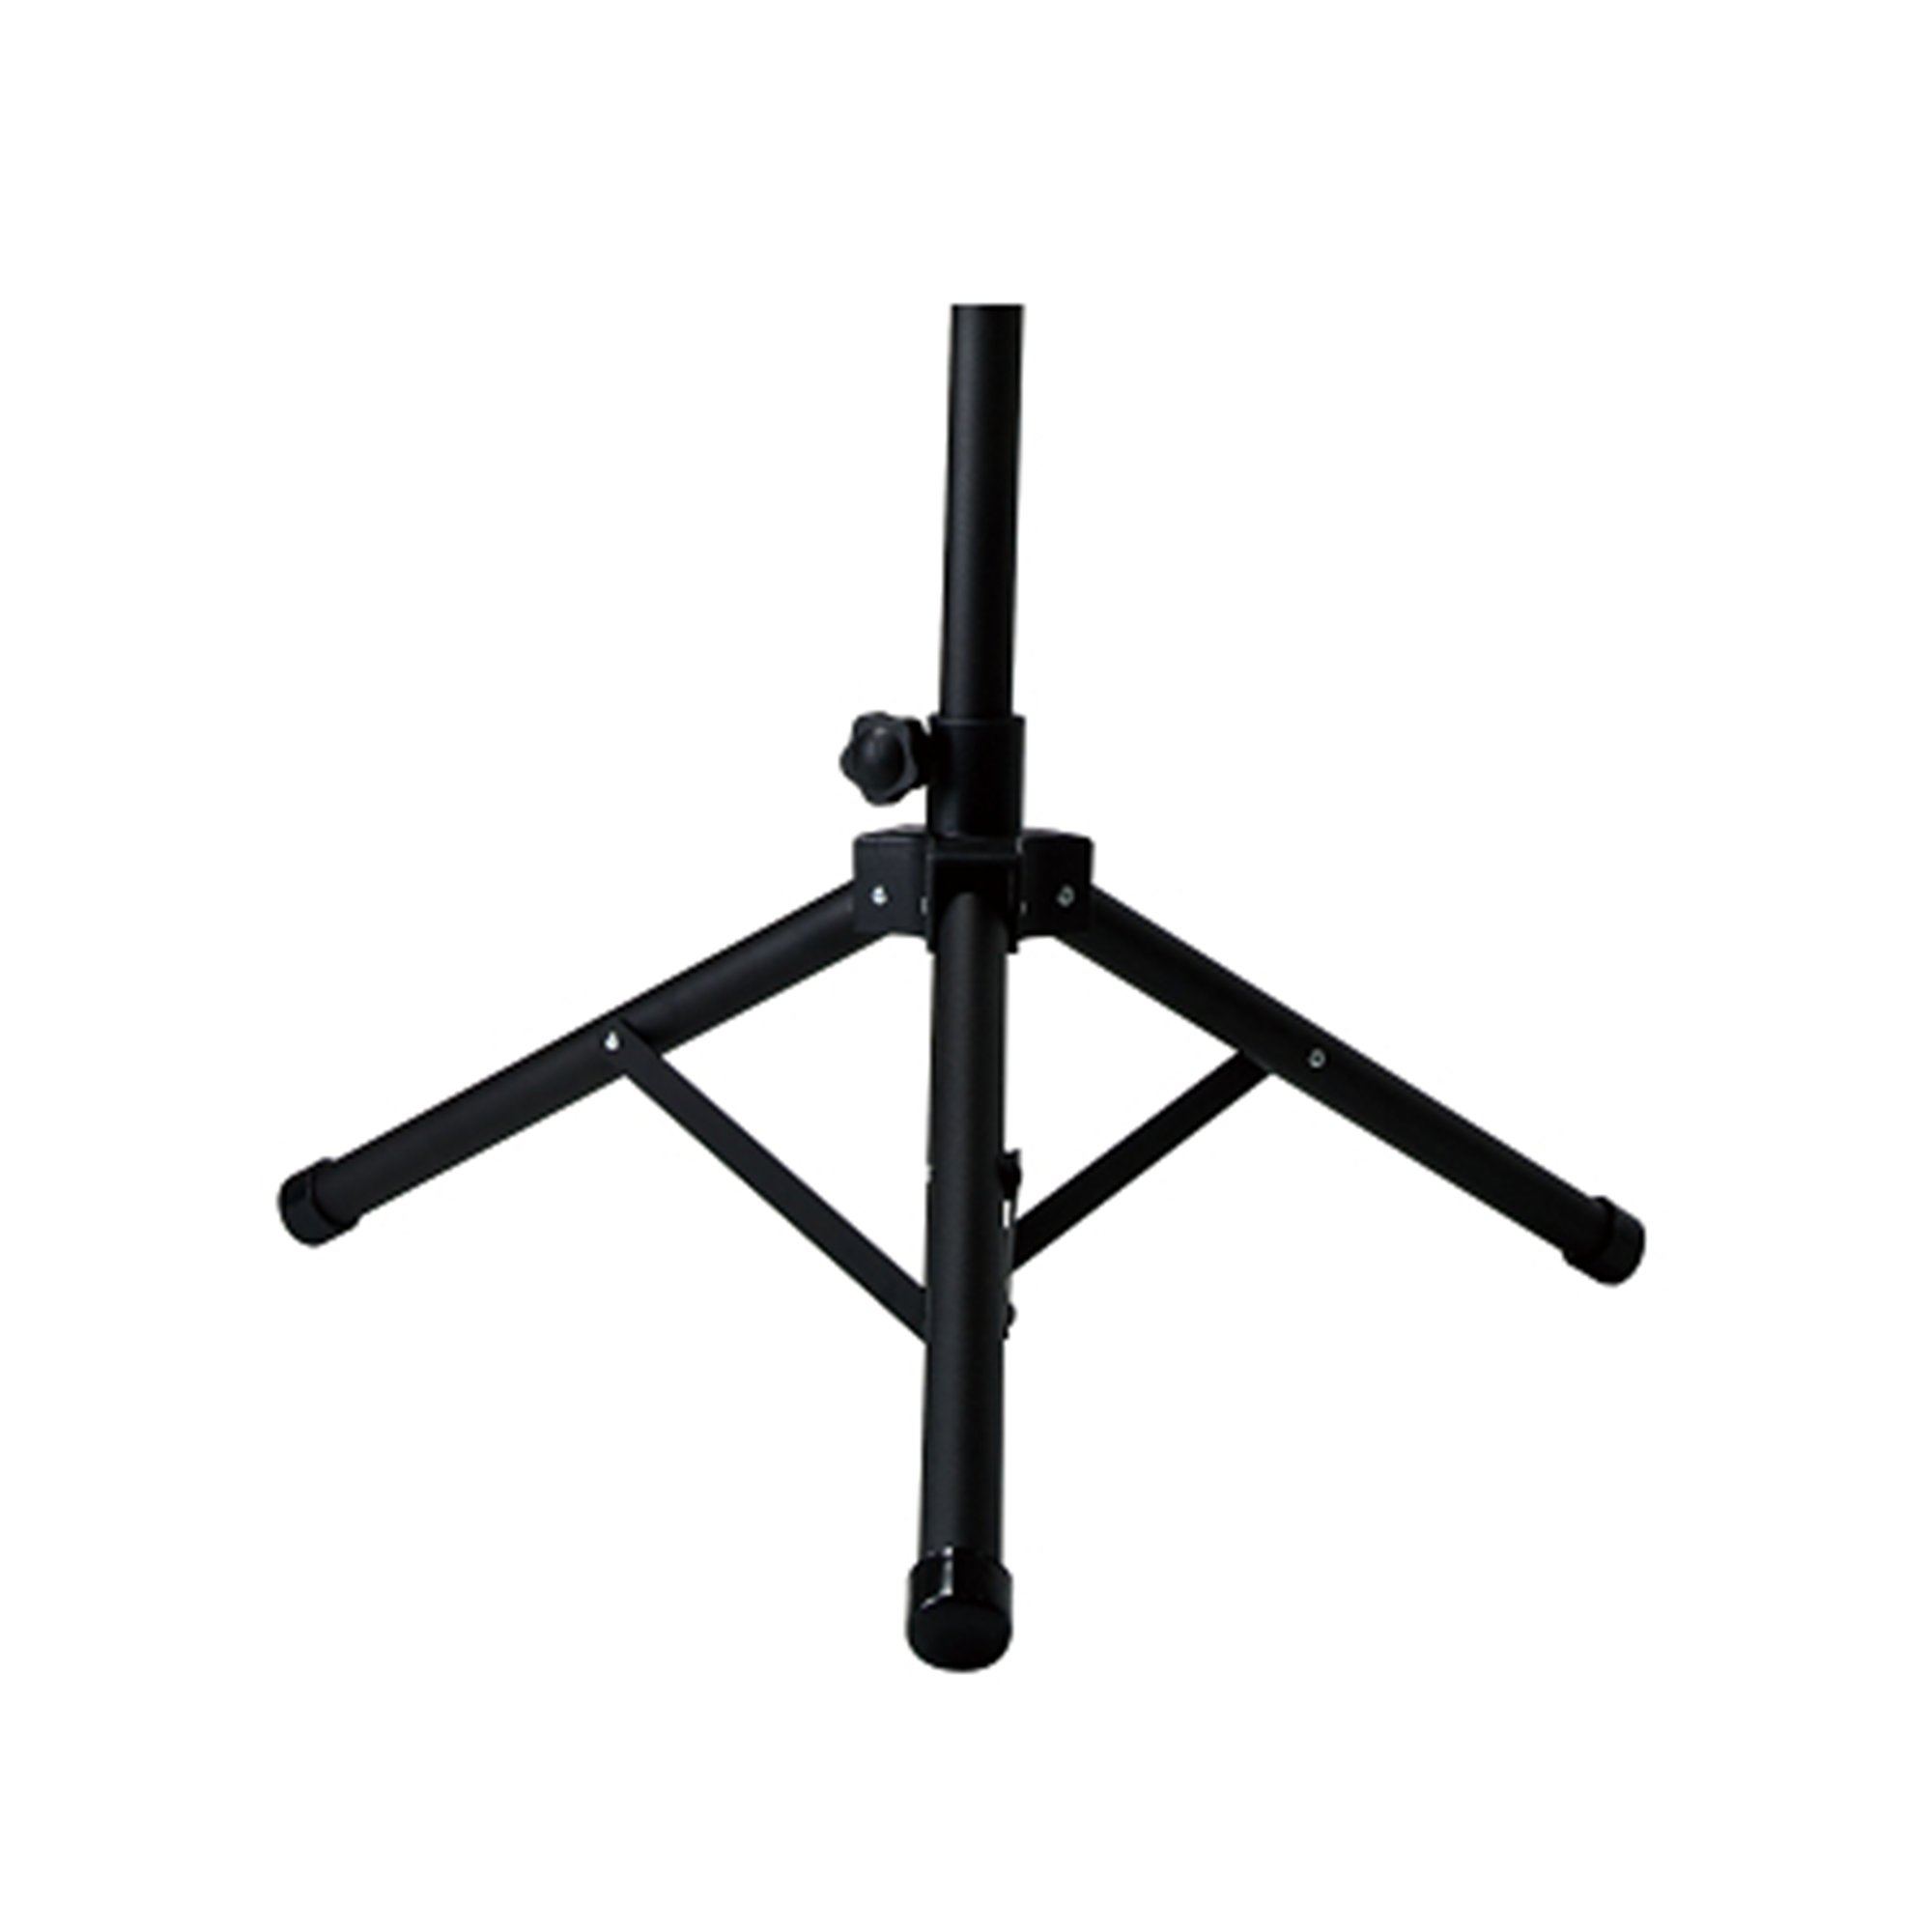 ST-750 Speaker stand